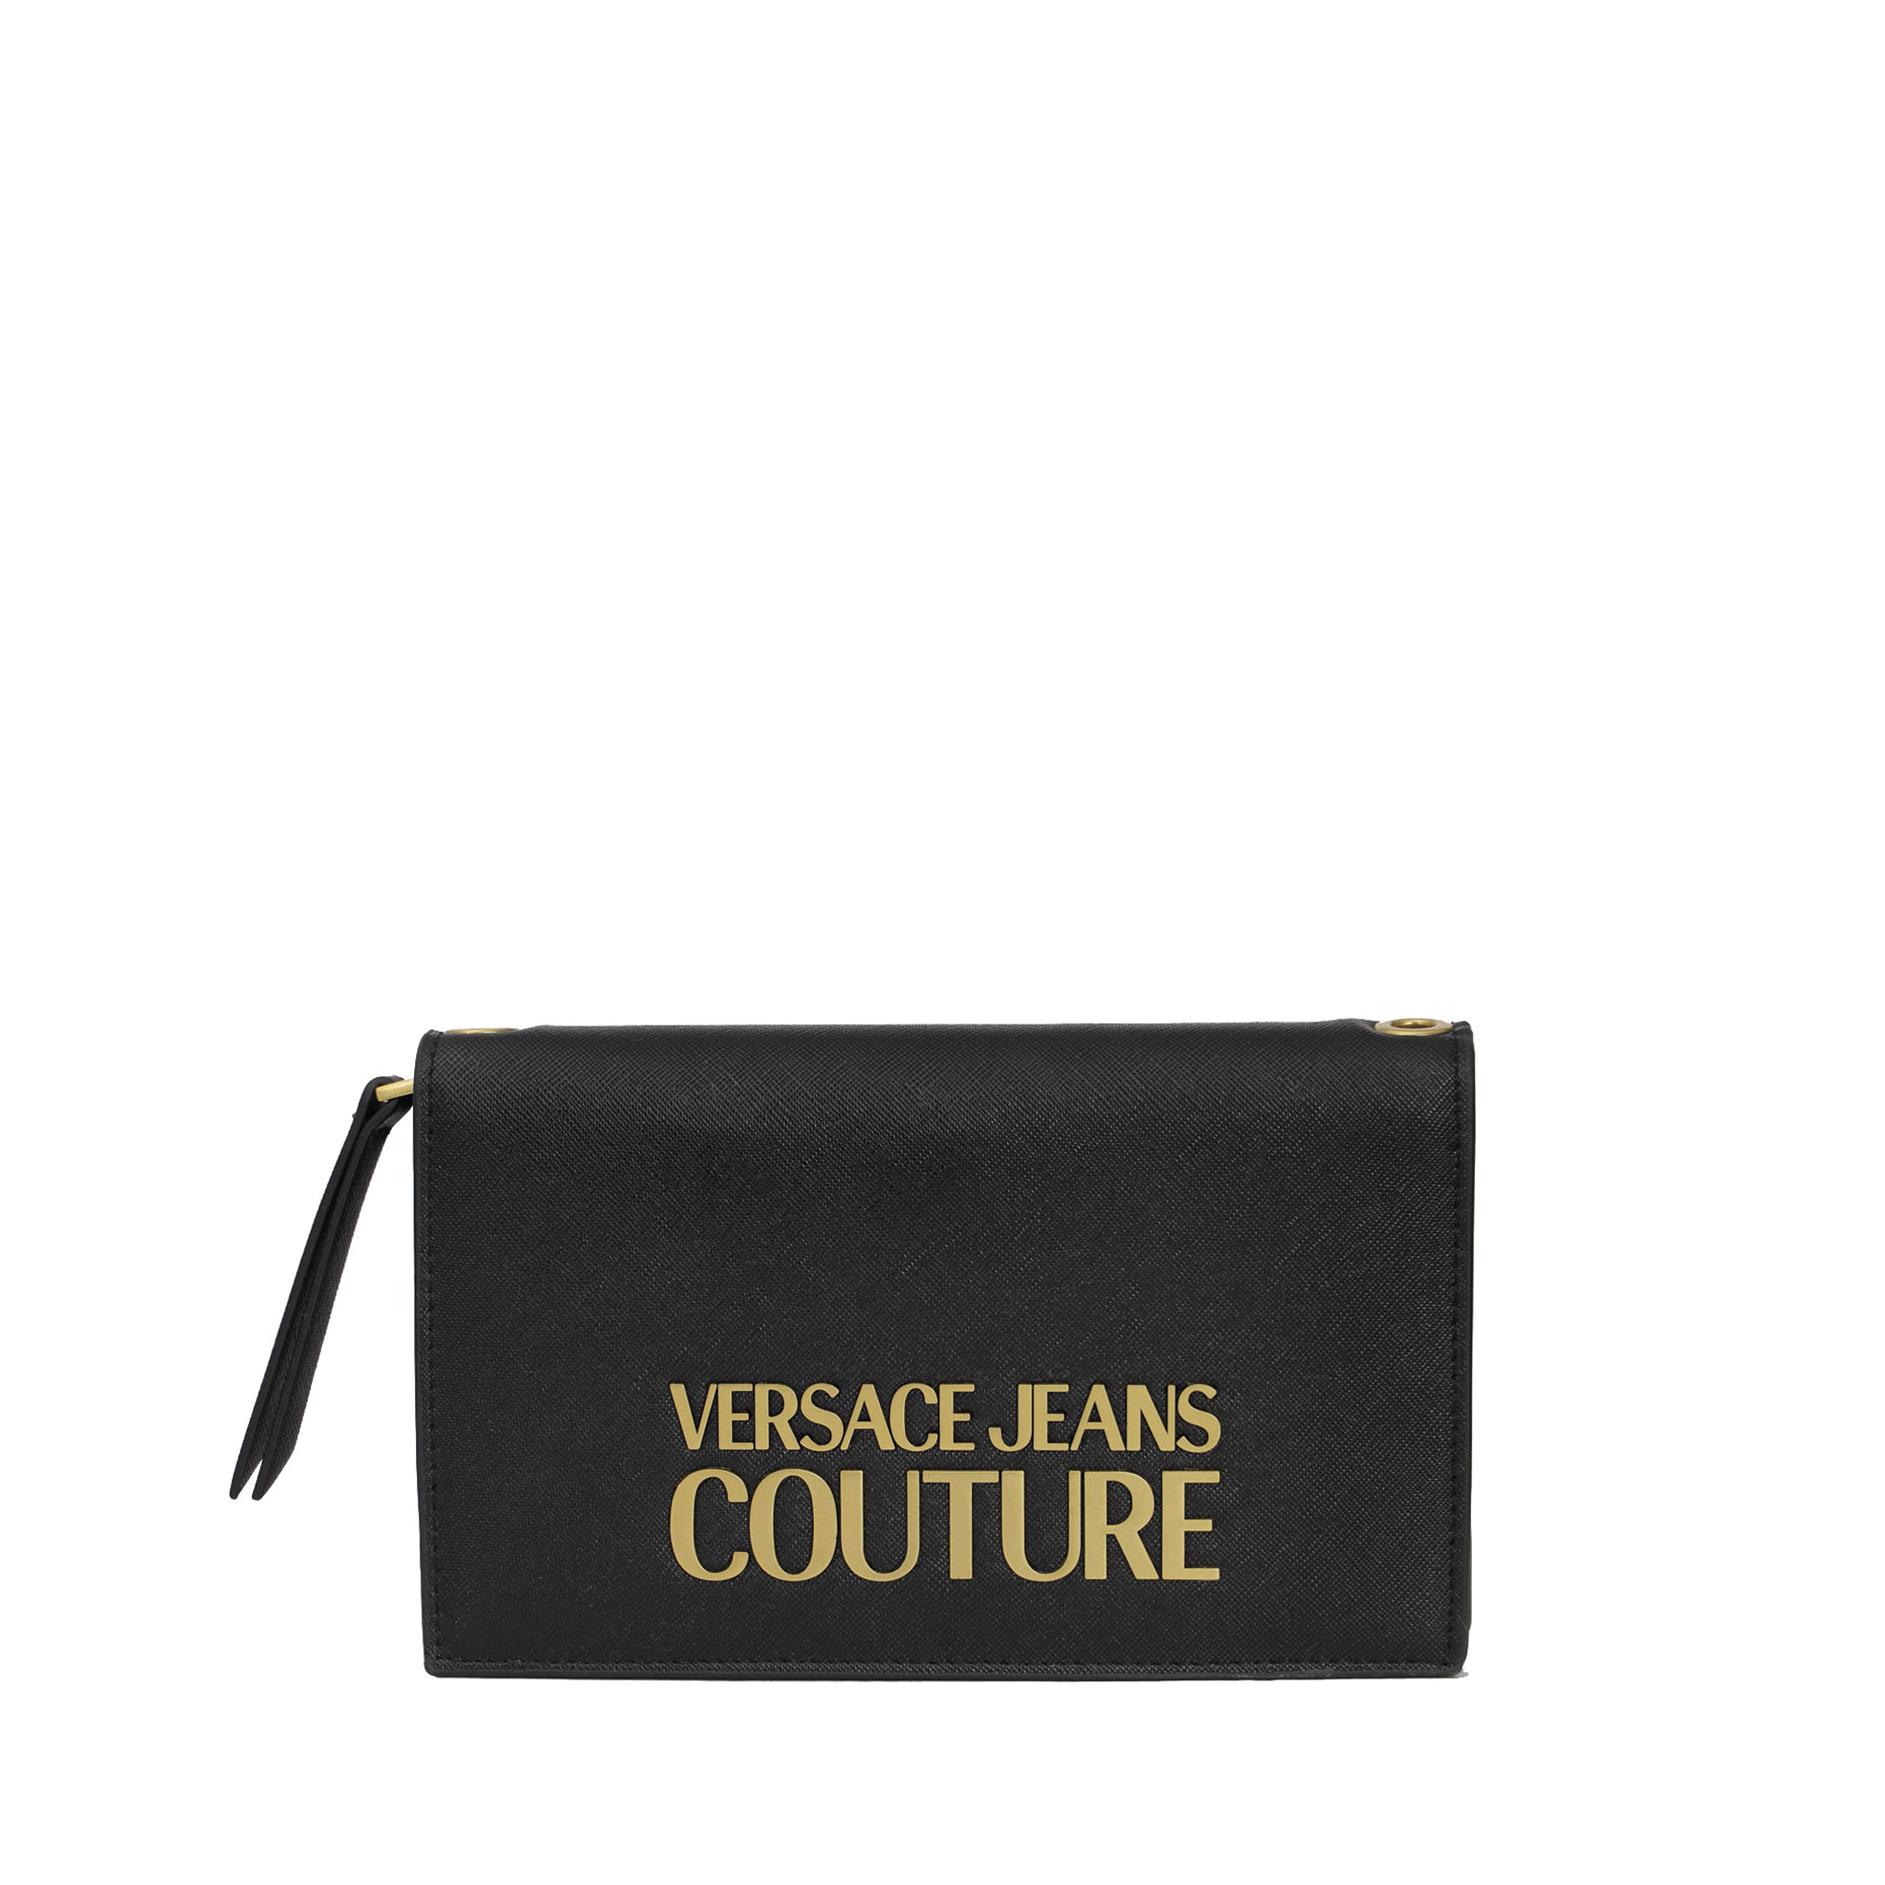 Pochette Versace Jeans 71VA5PL671879899 A.1